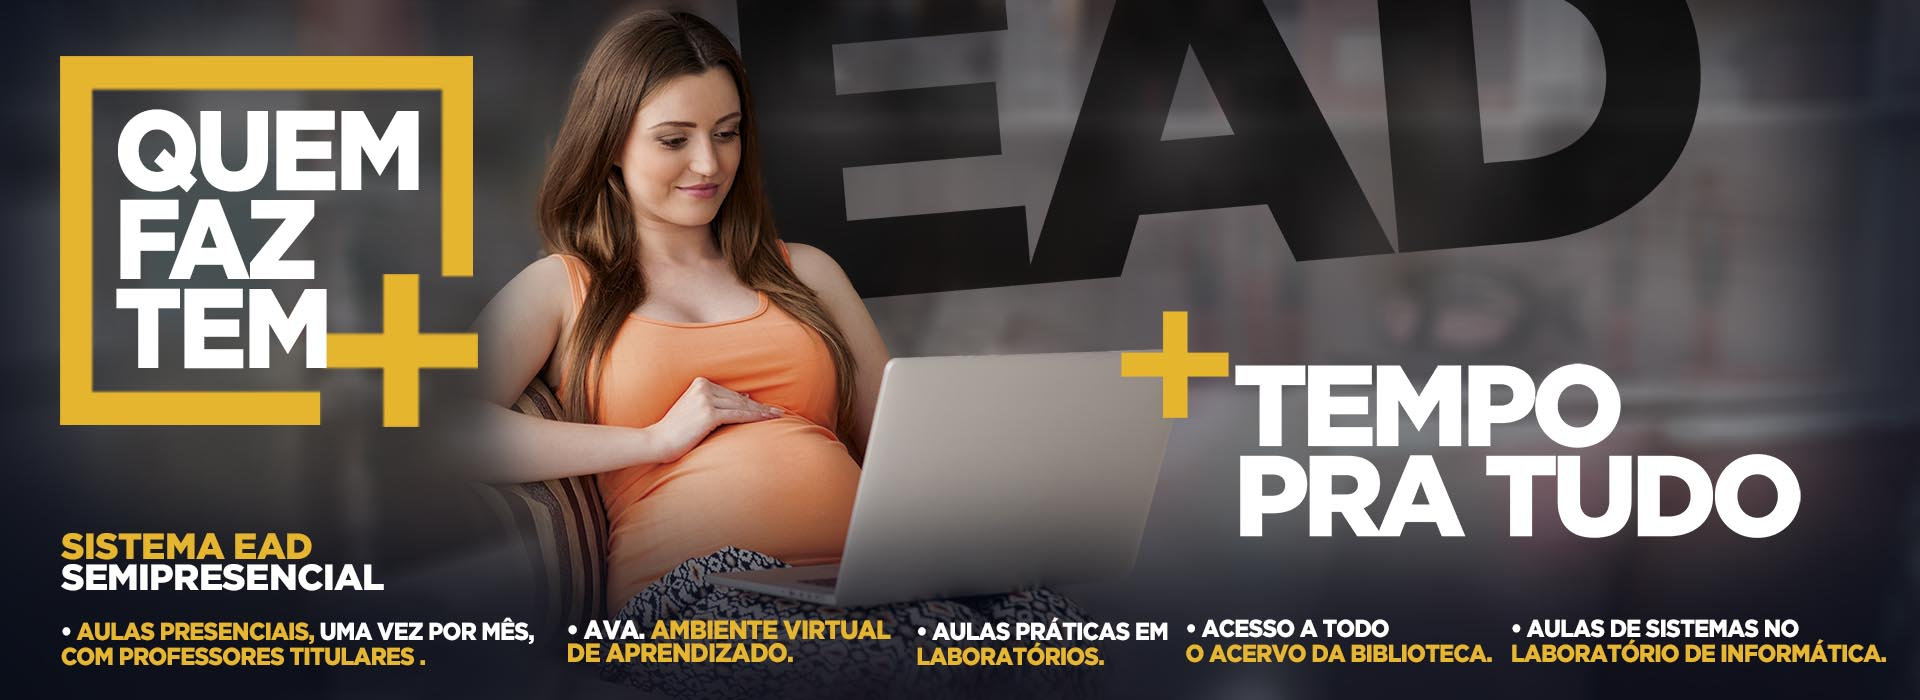 ead gravida